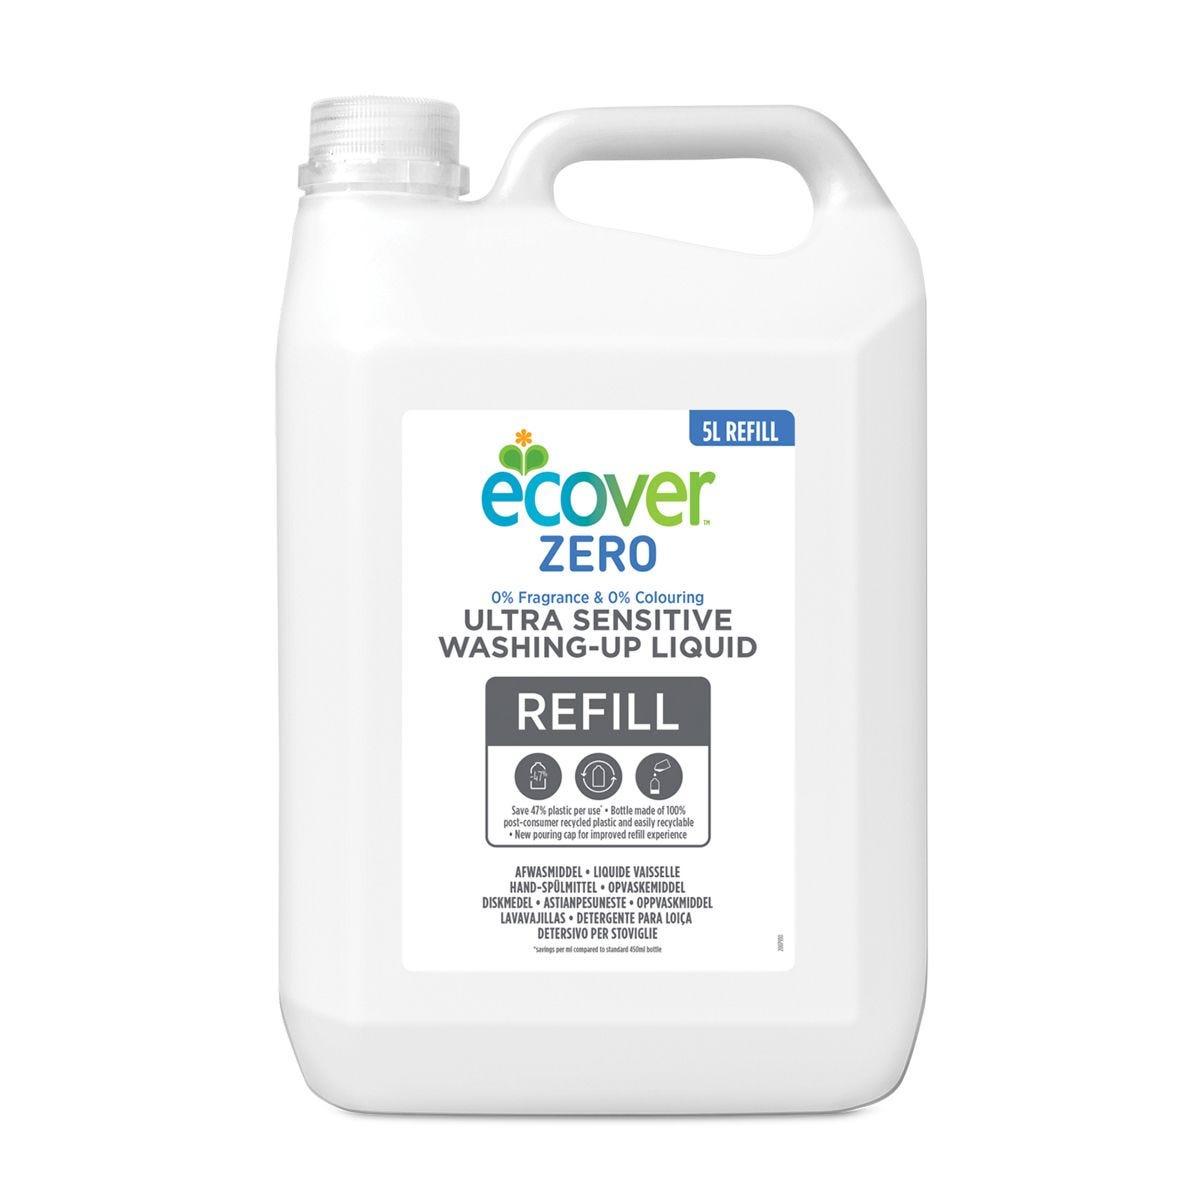 Ecover Zero Sensitive Washing Up Liquid - 5L Refill